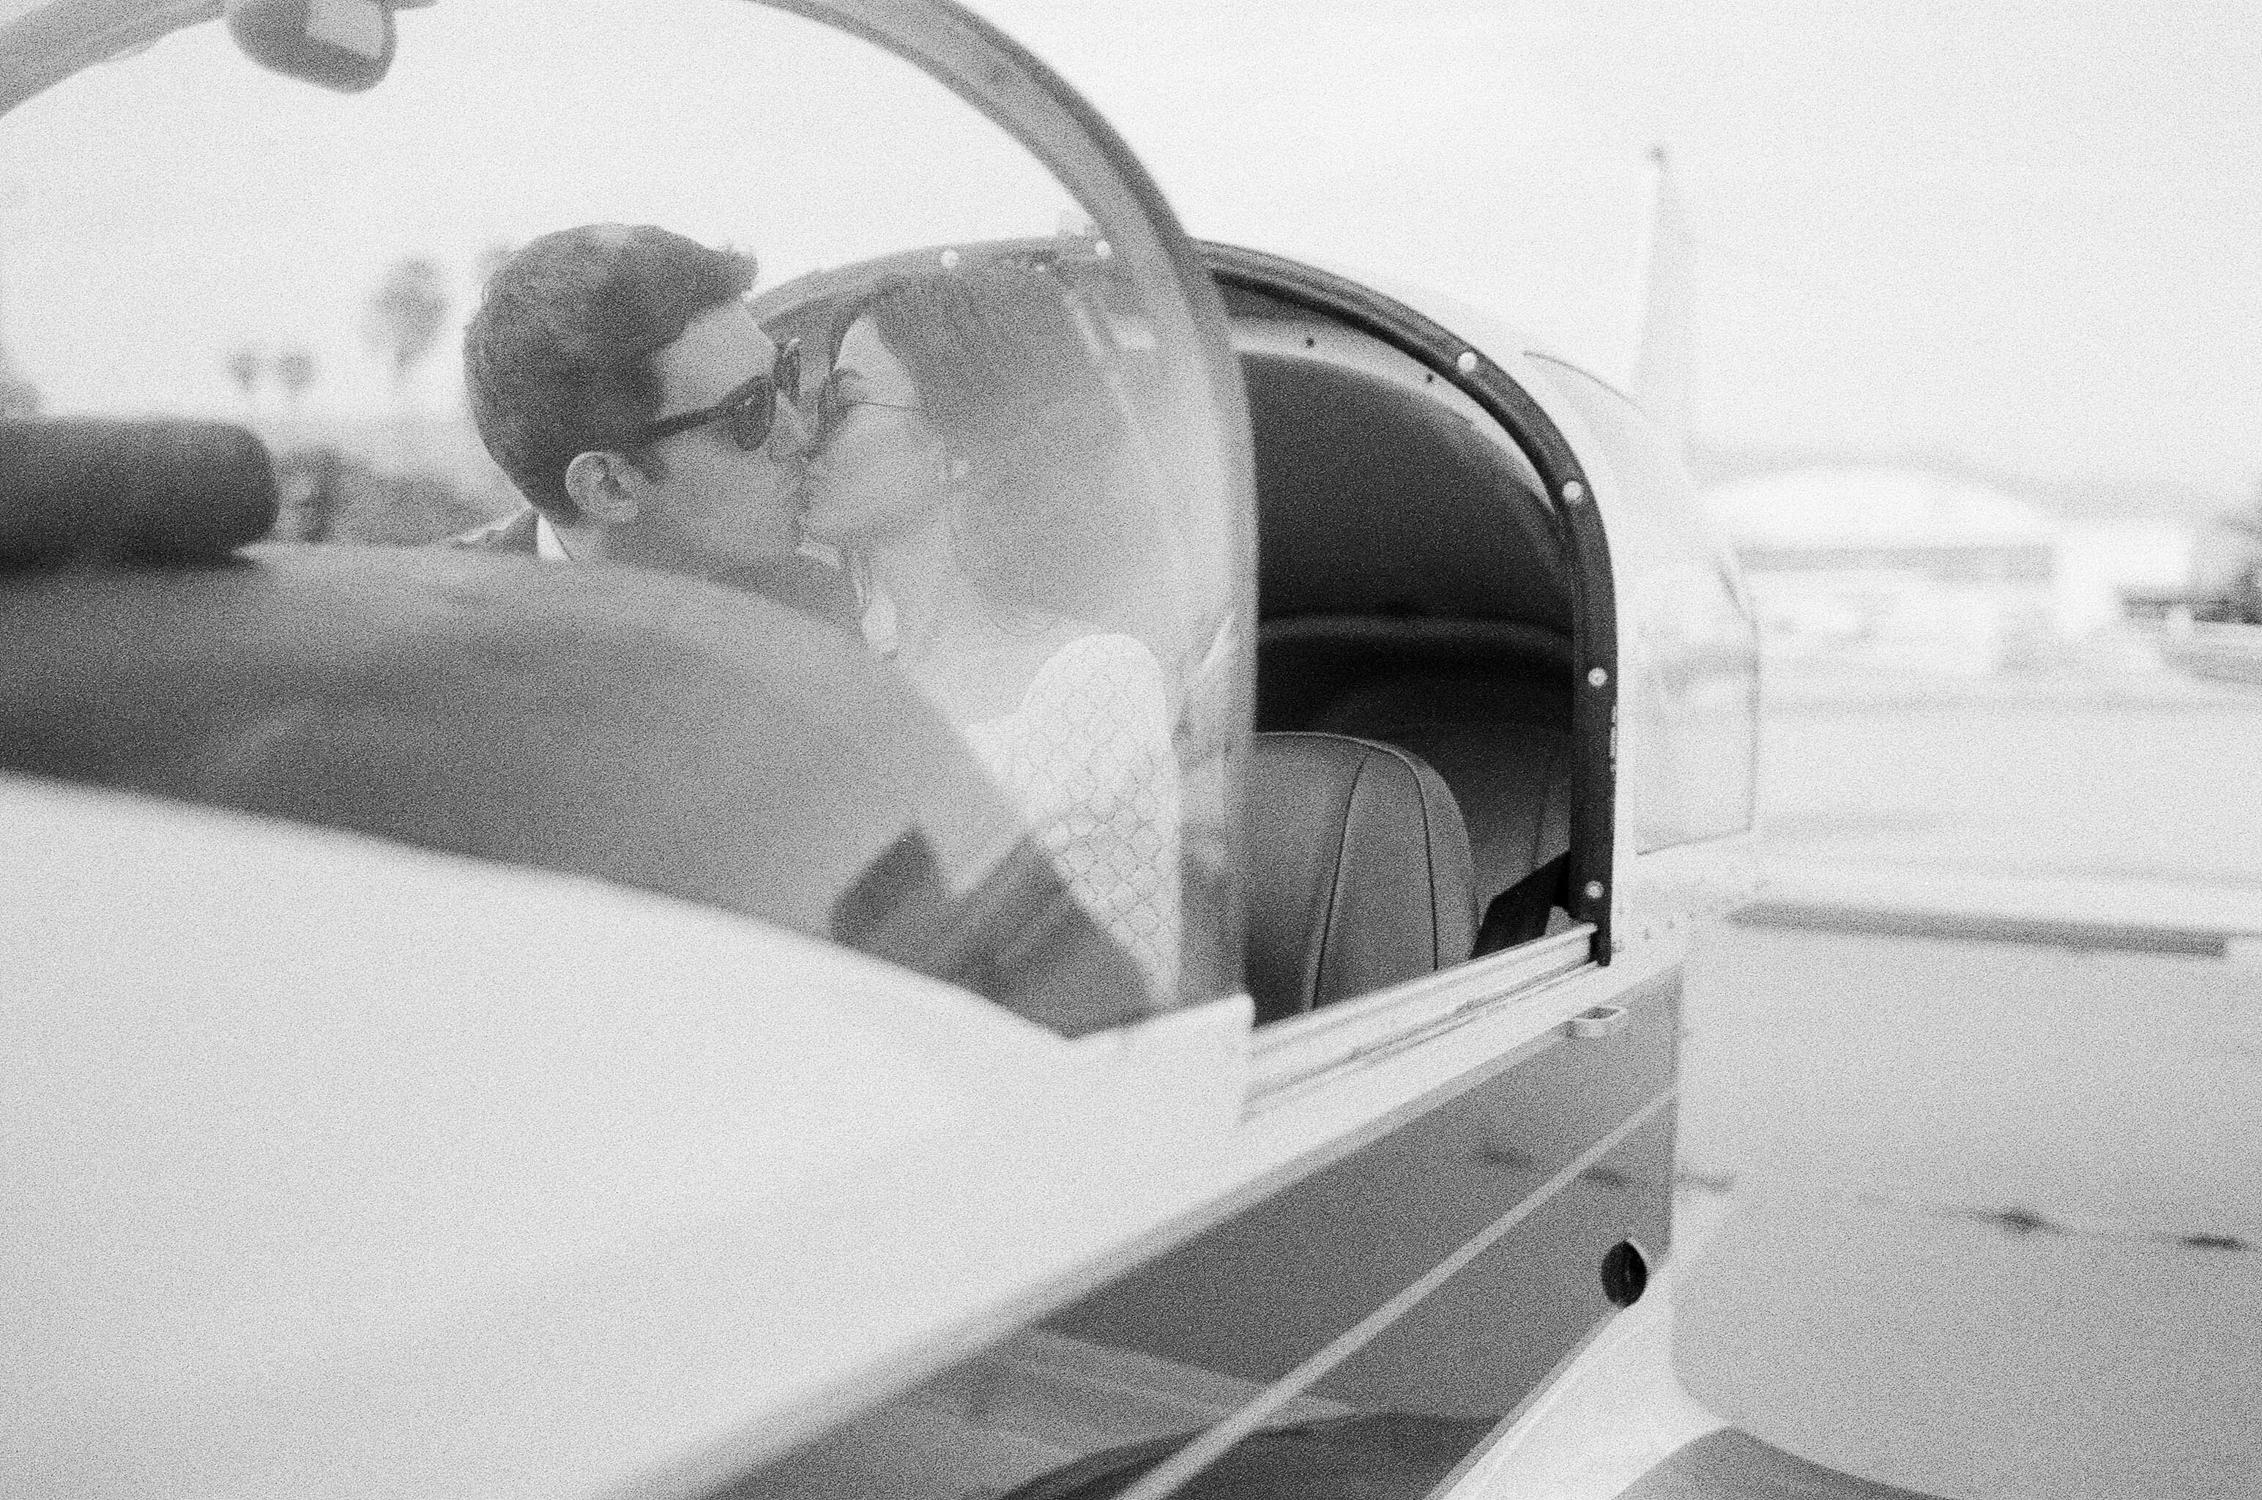 airport-engagement-shoot-33.jpg